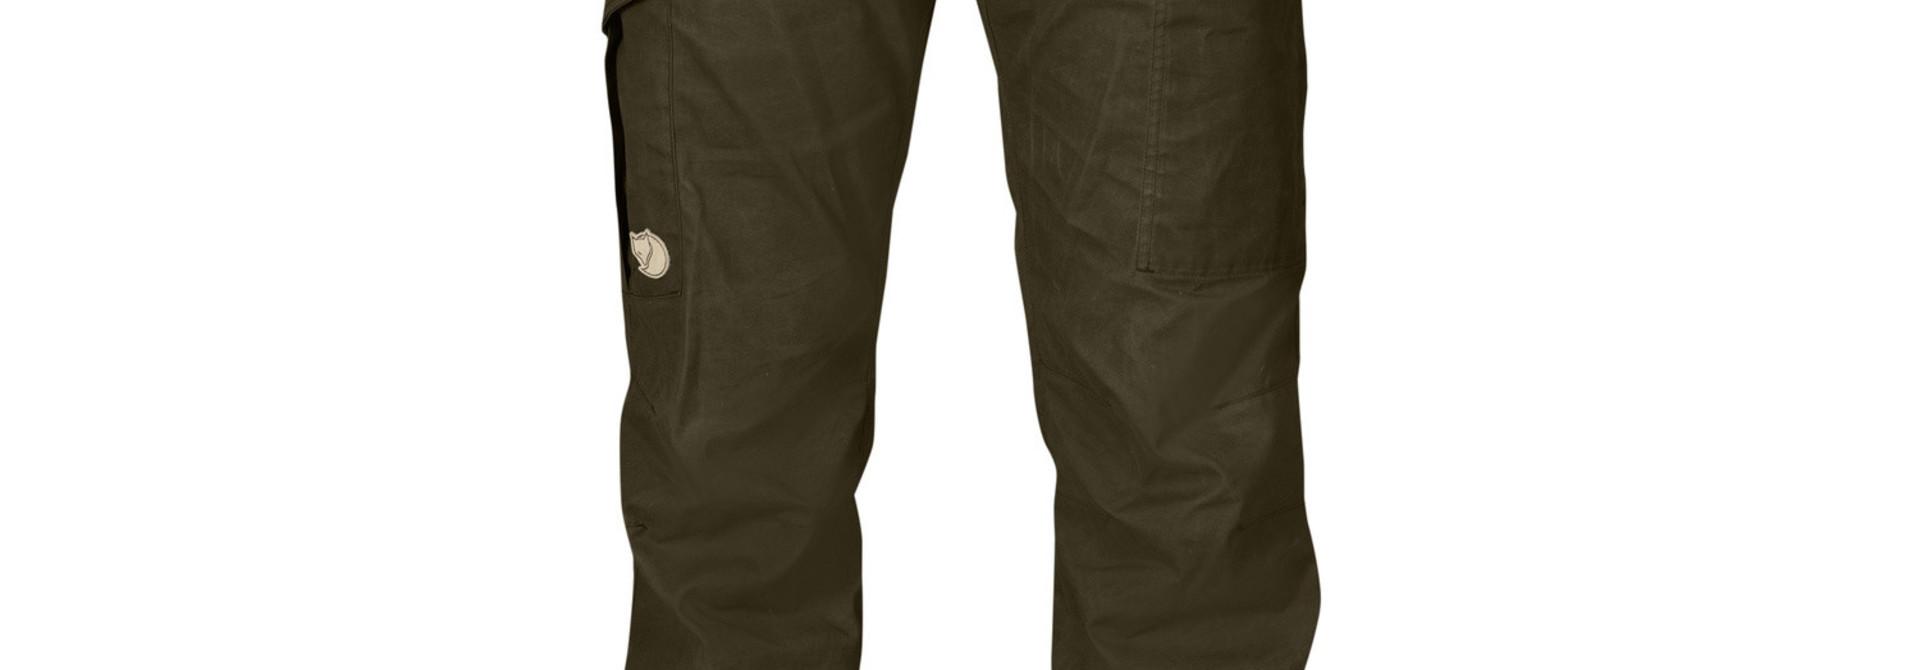 Fjällraven Karl Pro Trousers M Dark Olive